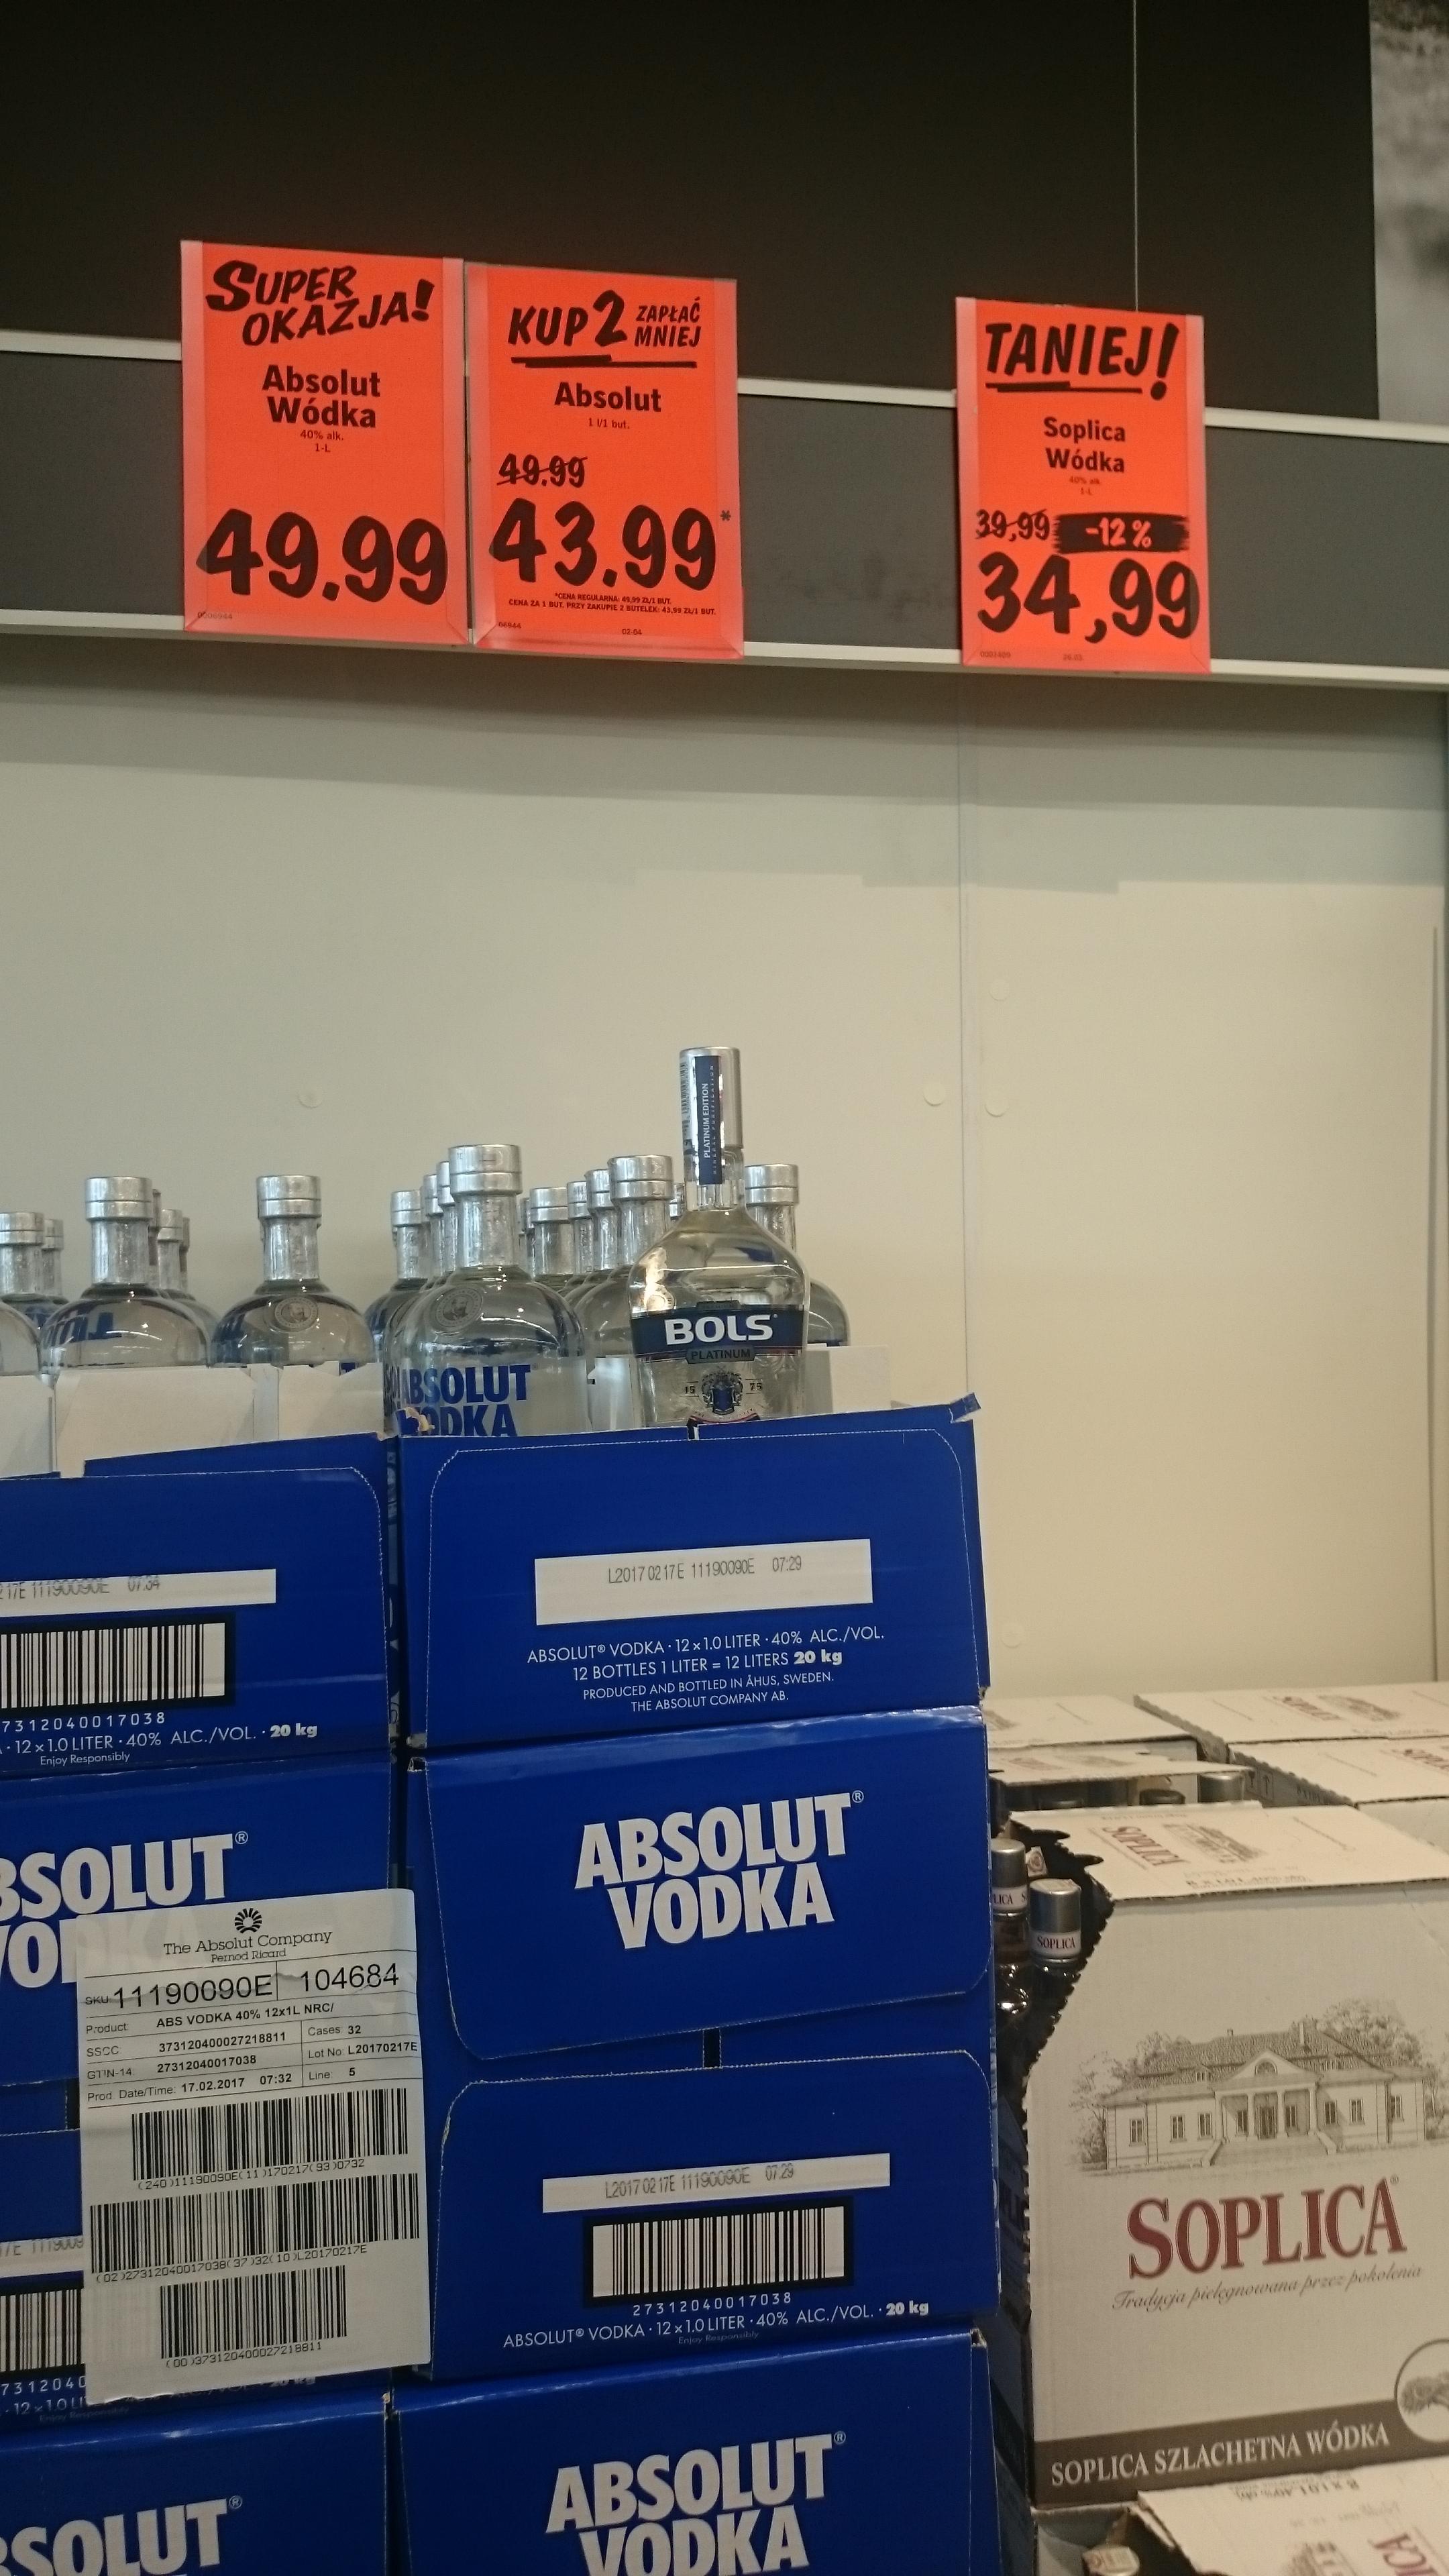 Wódka Absolut 1L przy zakupie 2 takich butelek w Lidlu